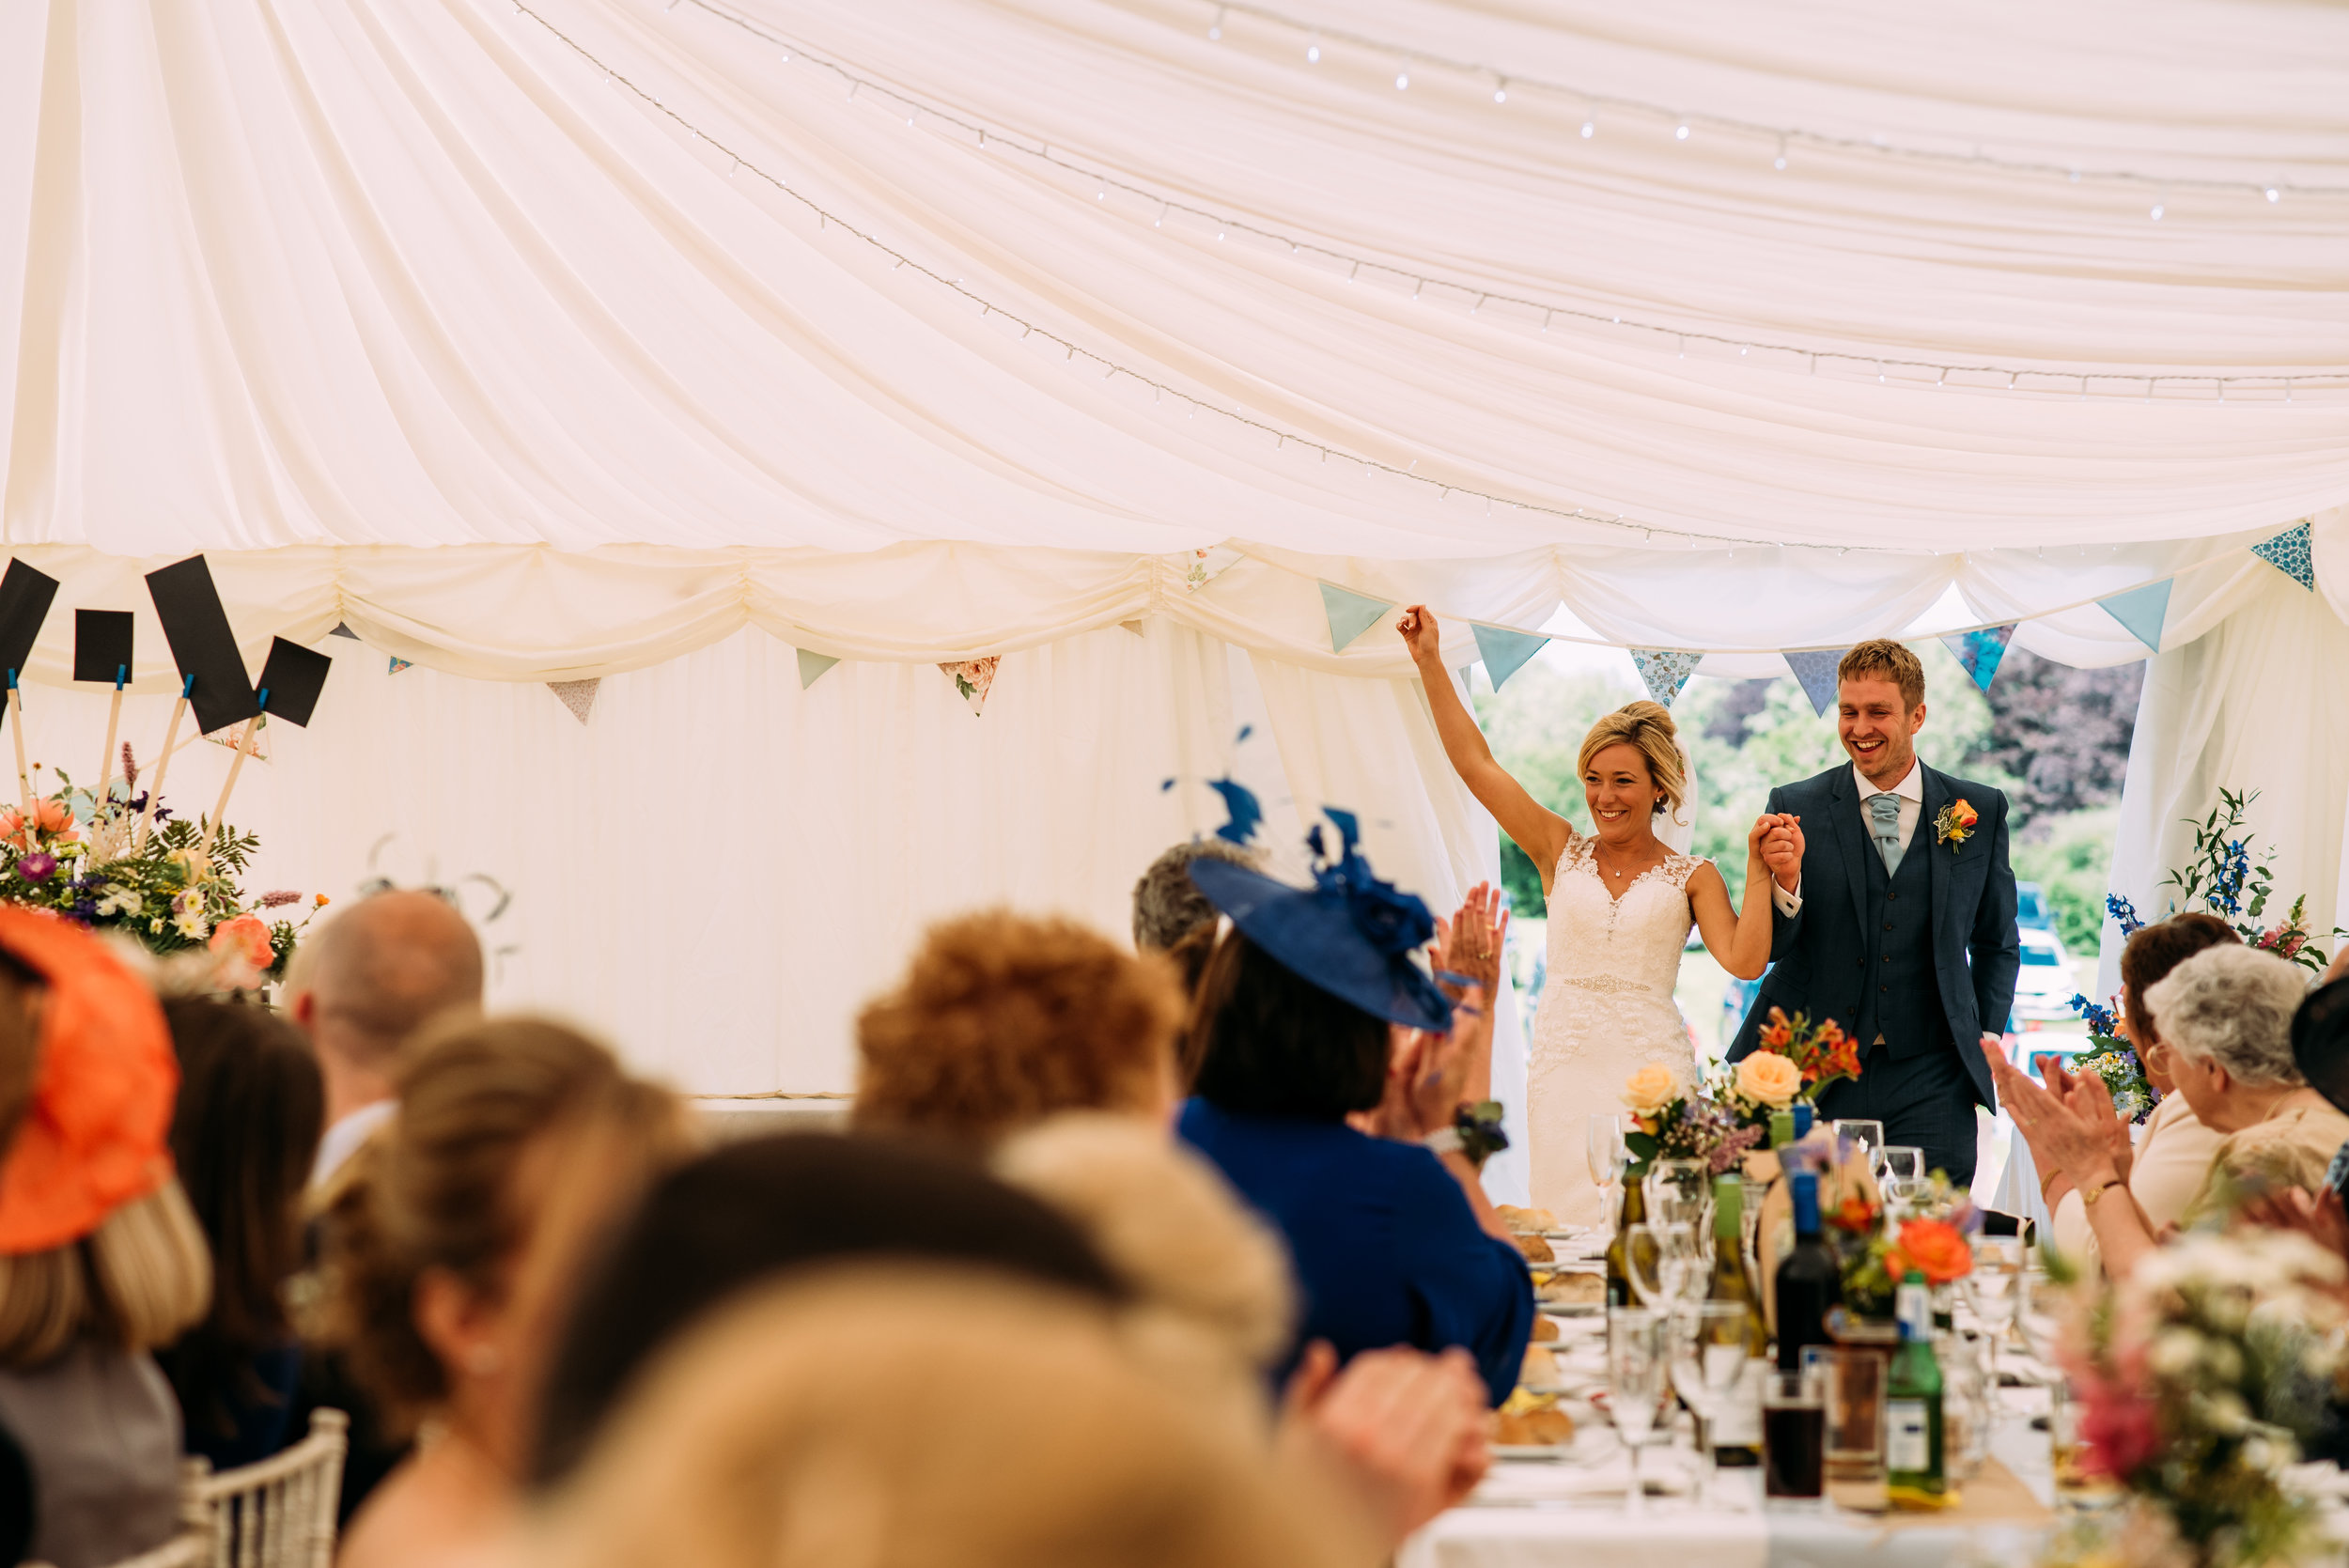 the bride and groom enter their wedding breakfast to huge cheer